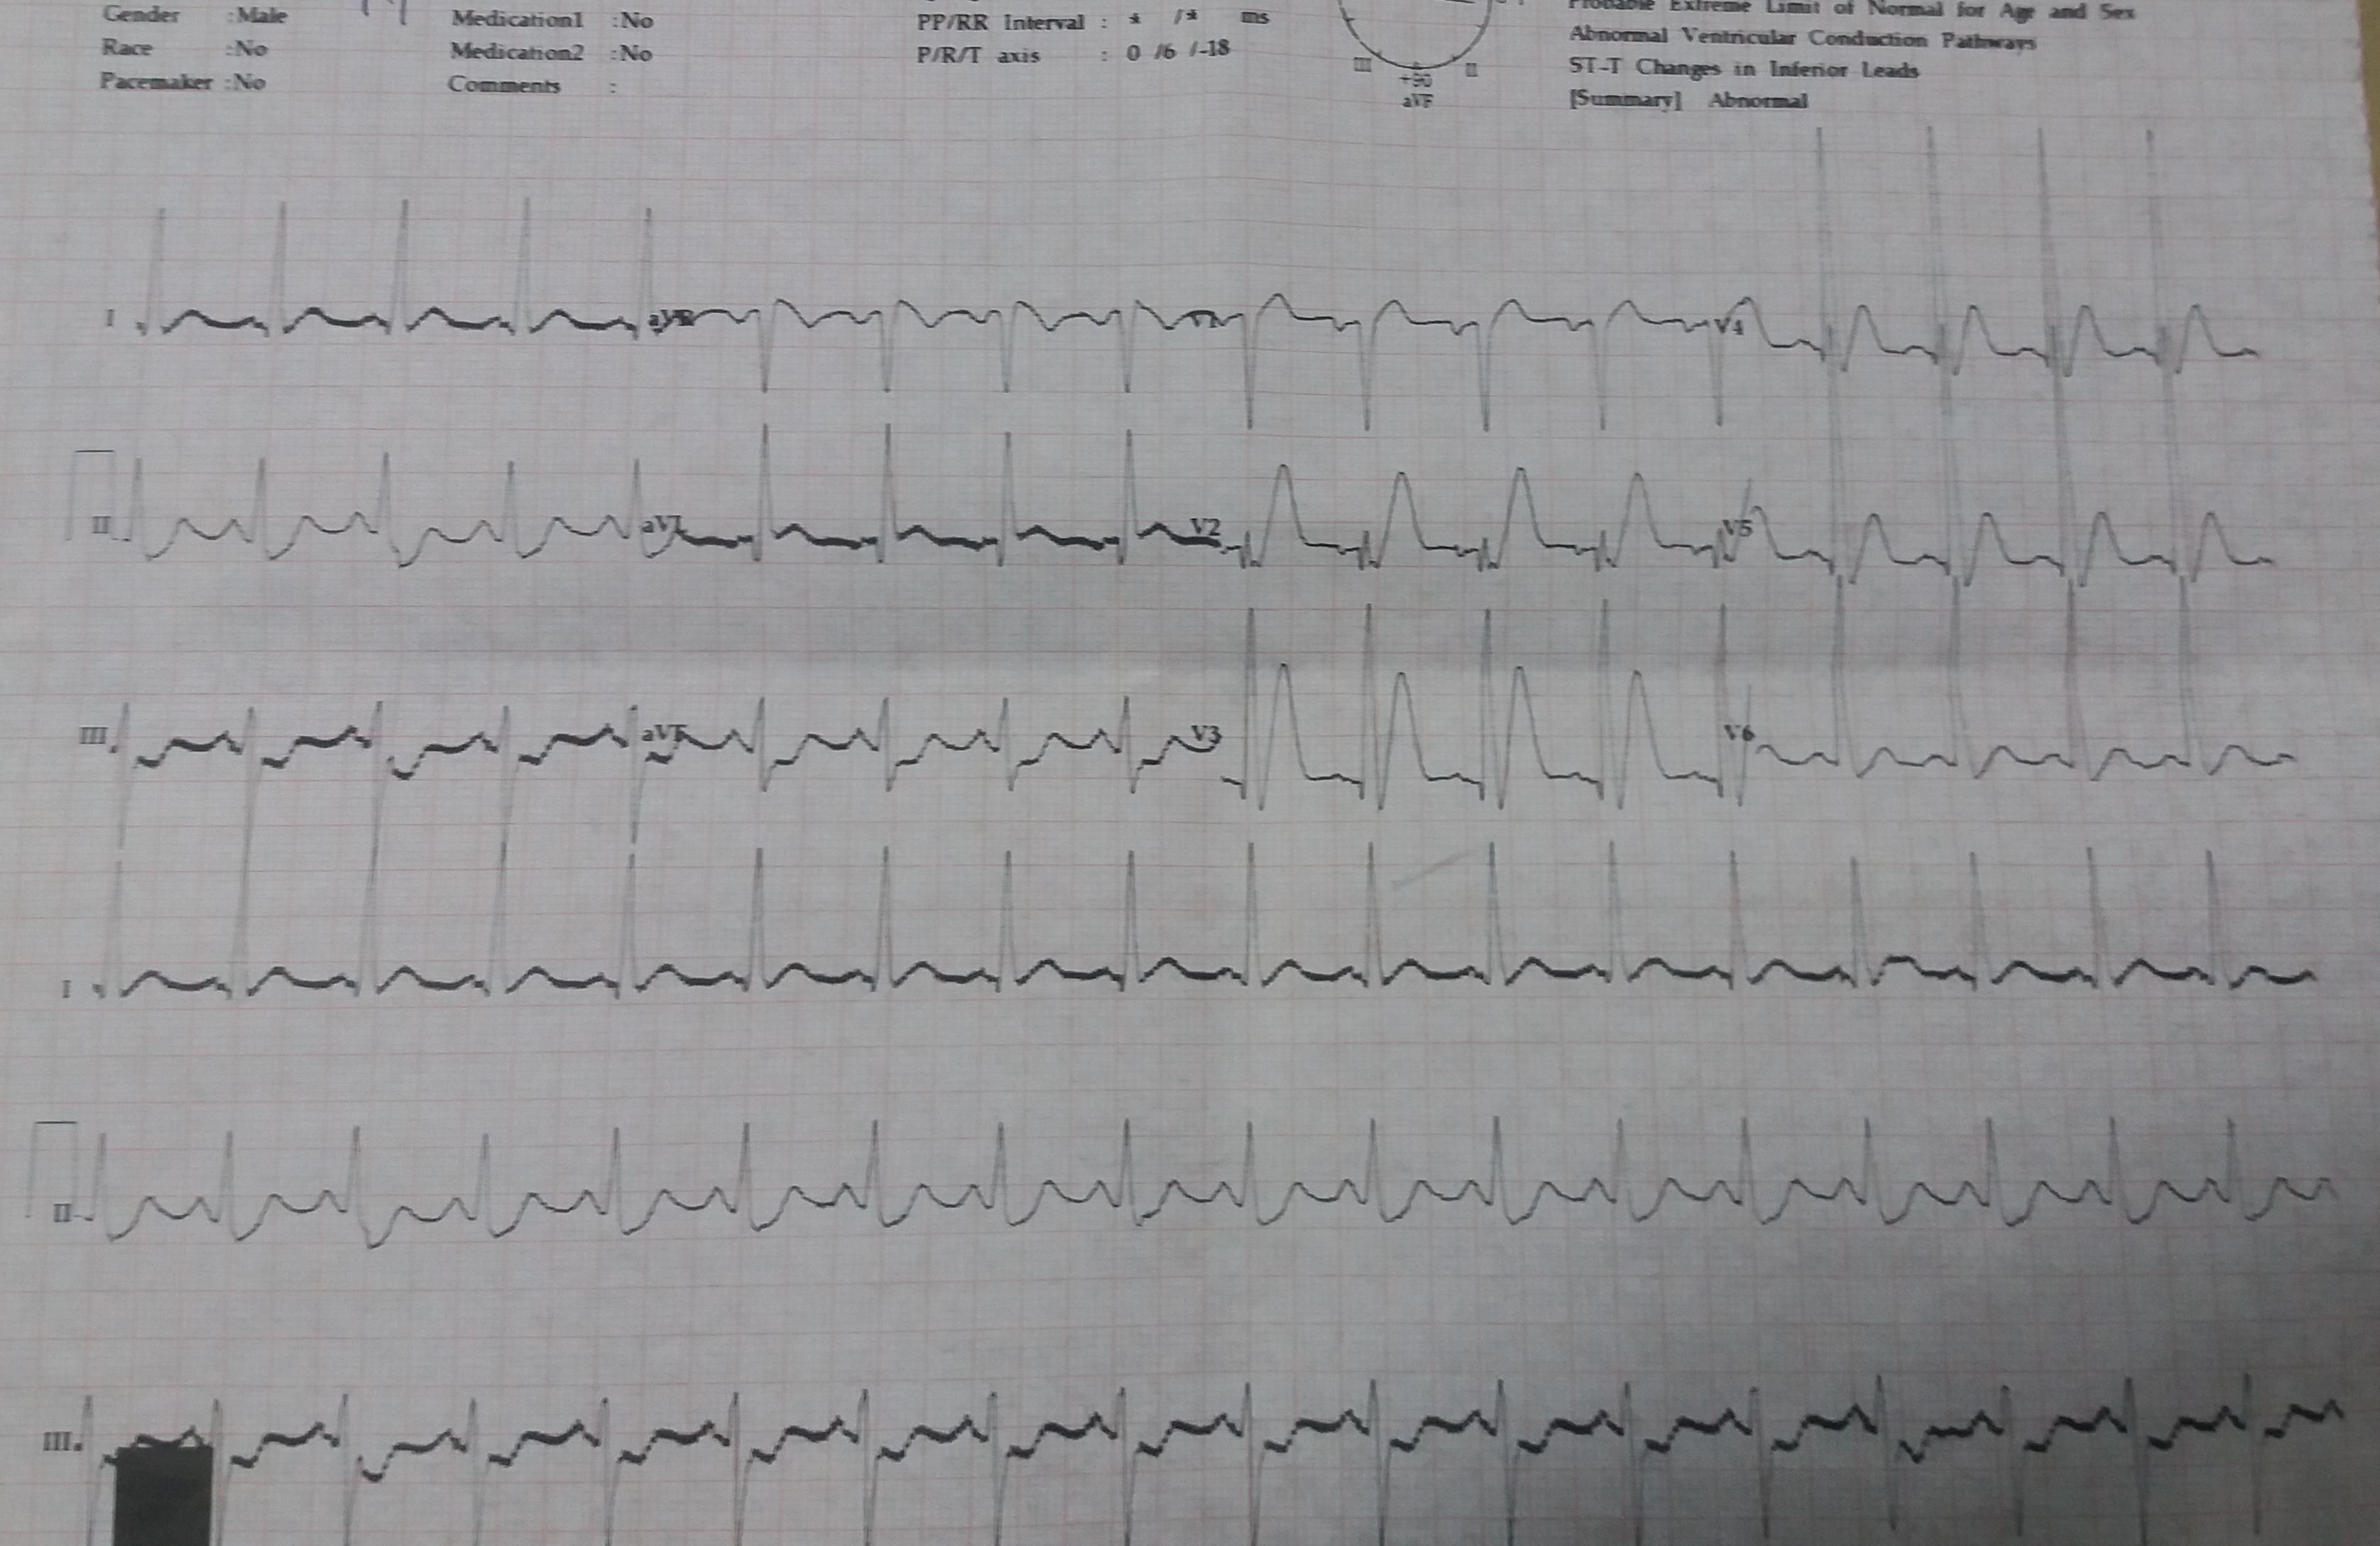 alt: ECG Data